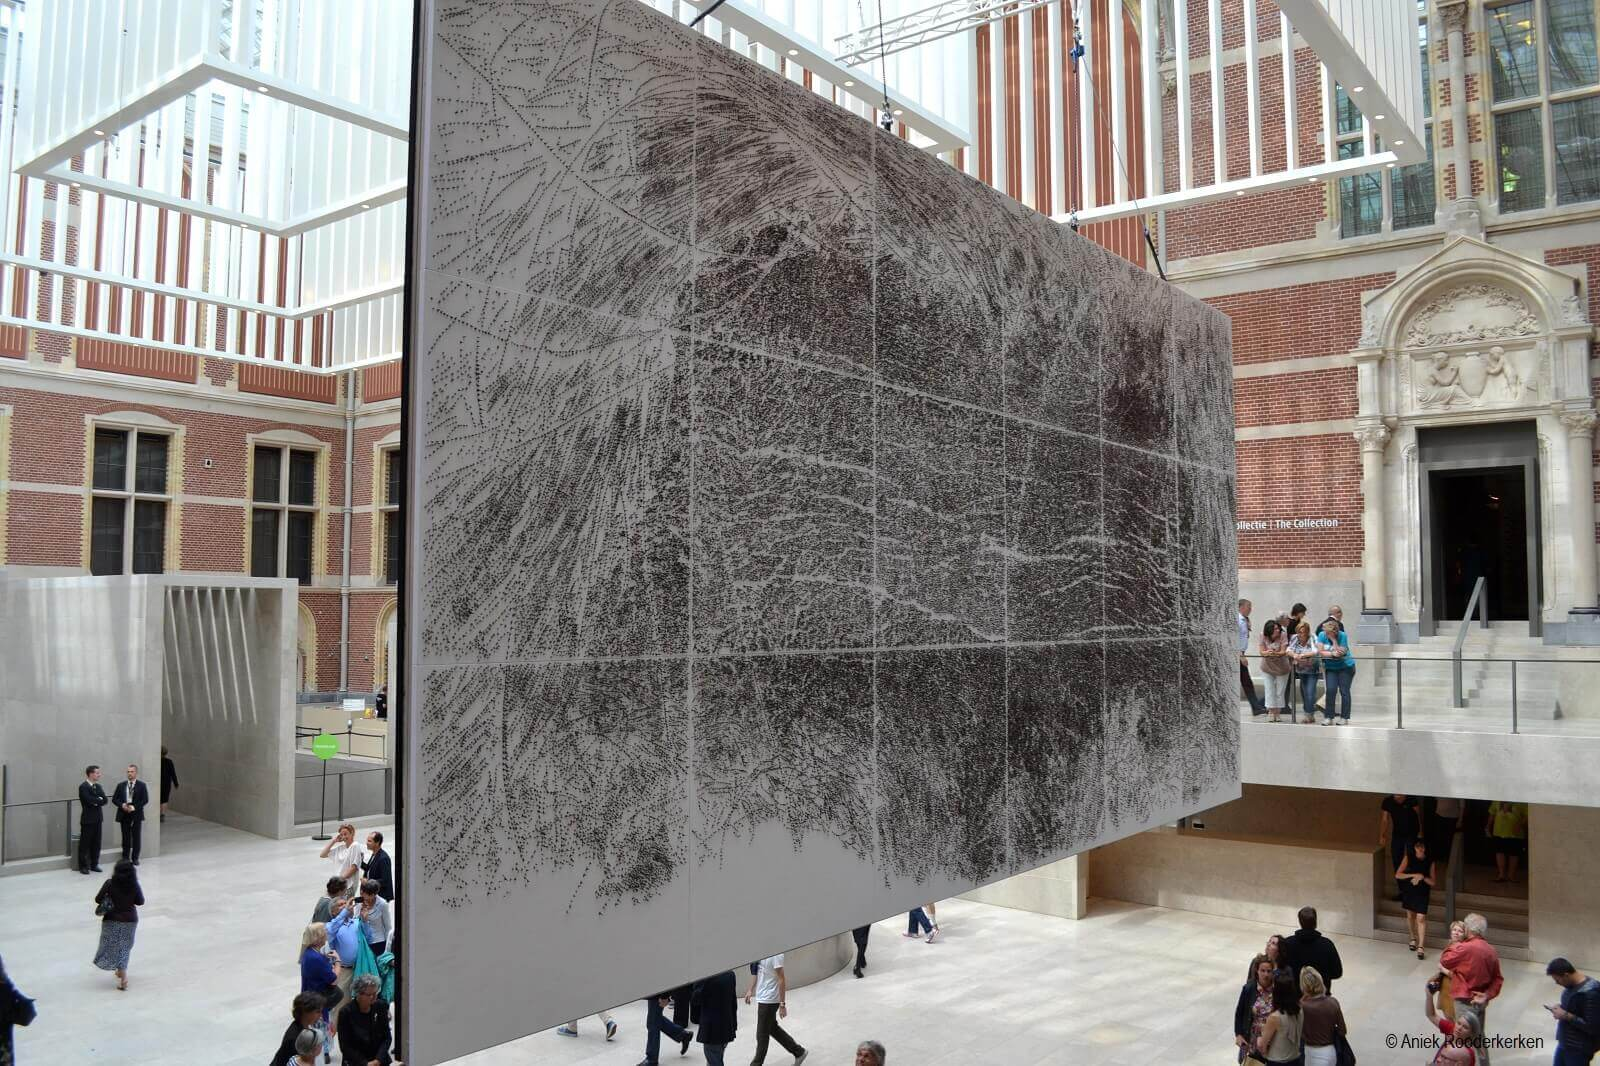 Spine d'Acacia - Giano, Giuseppe Penone, Rijksmuseum